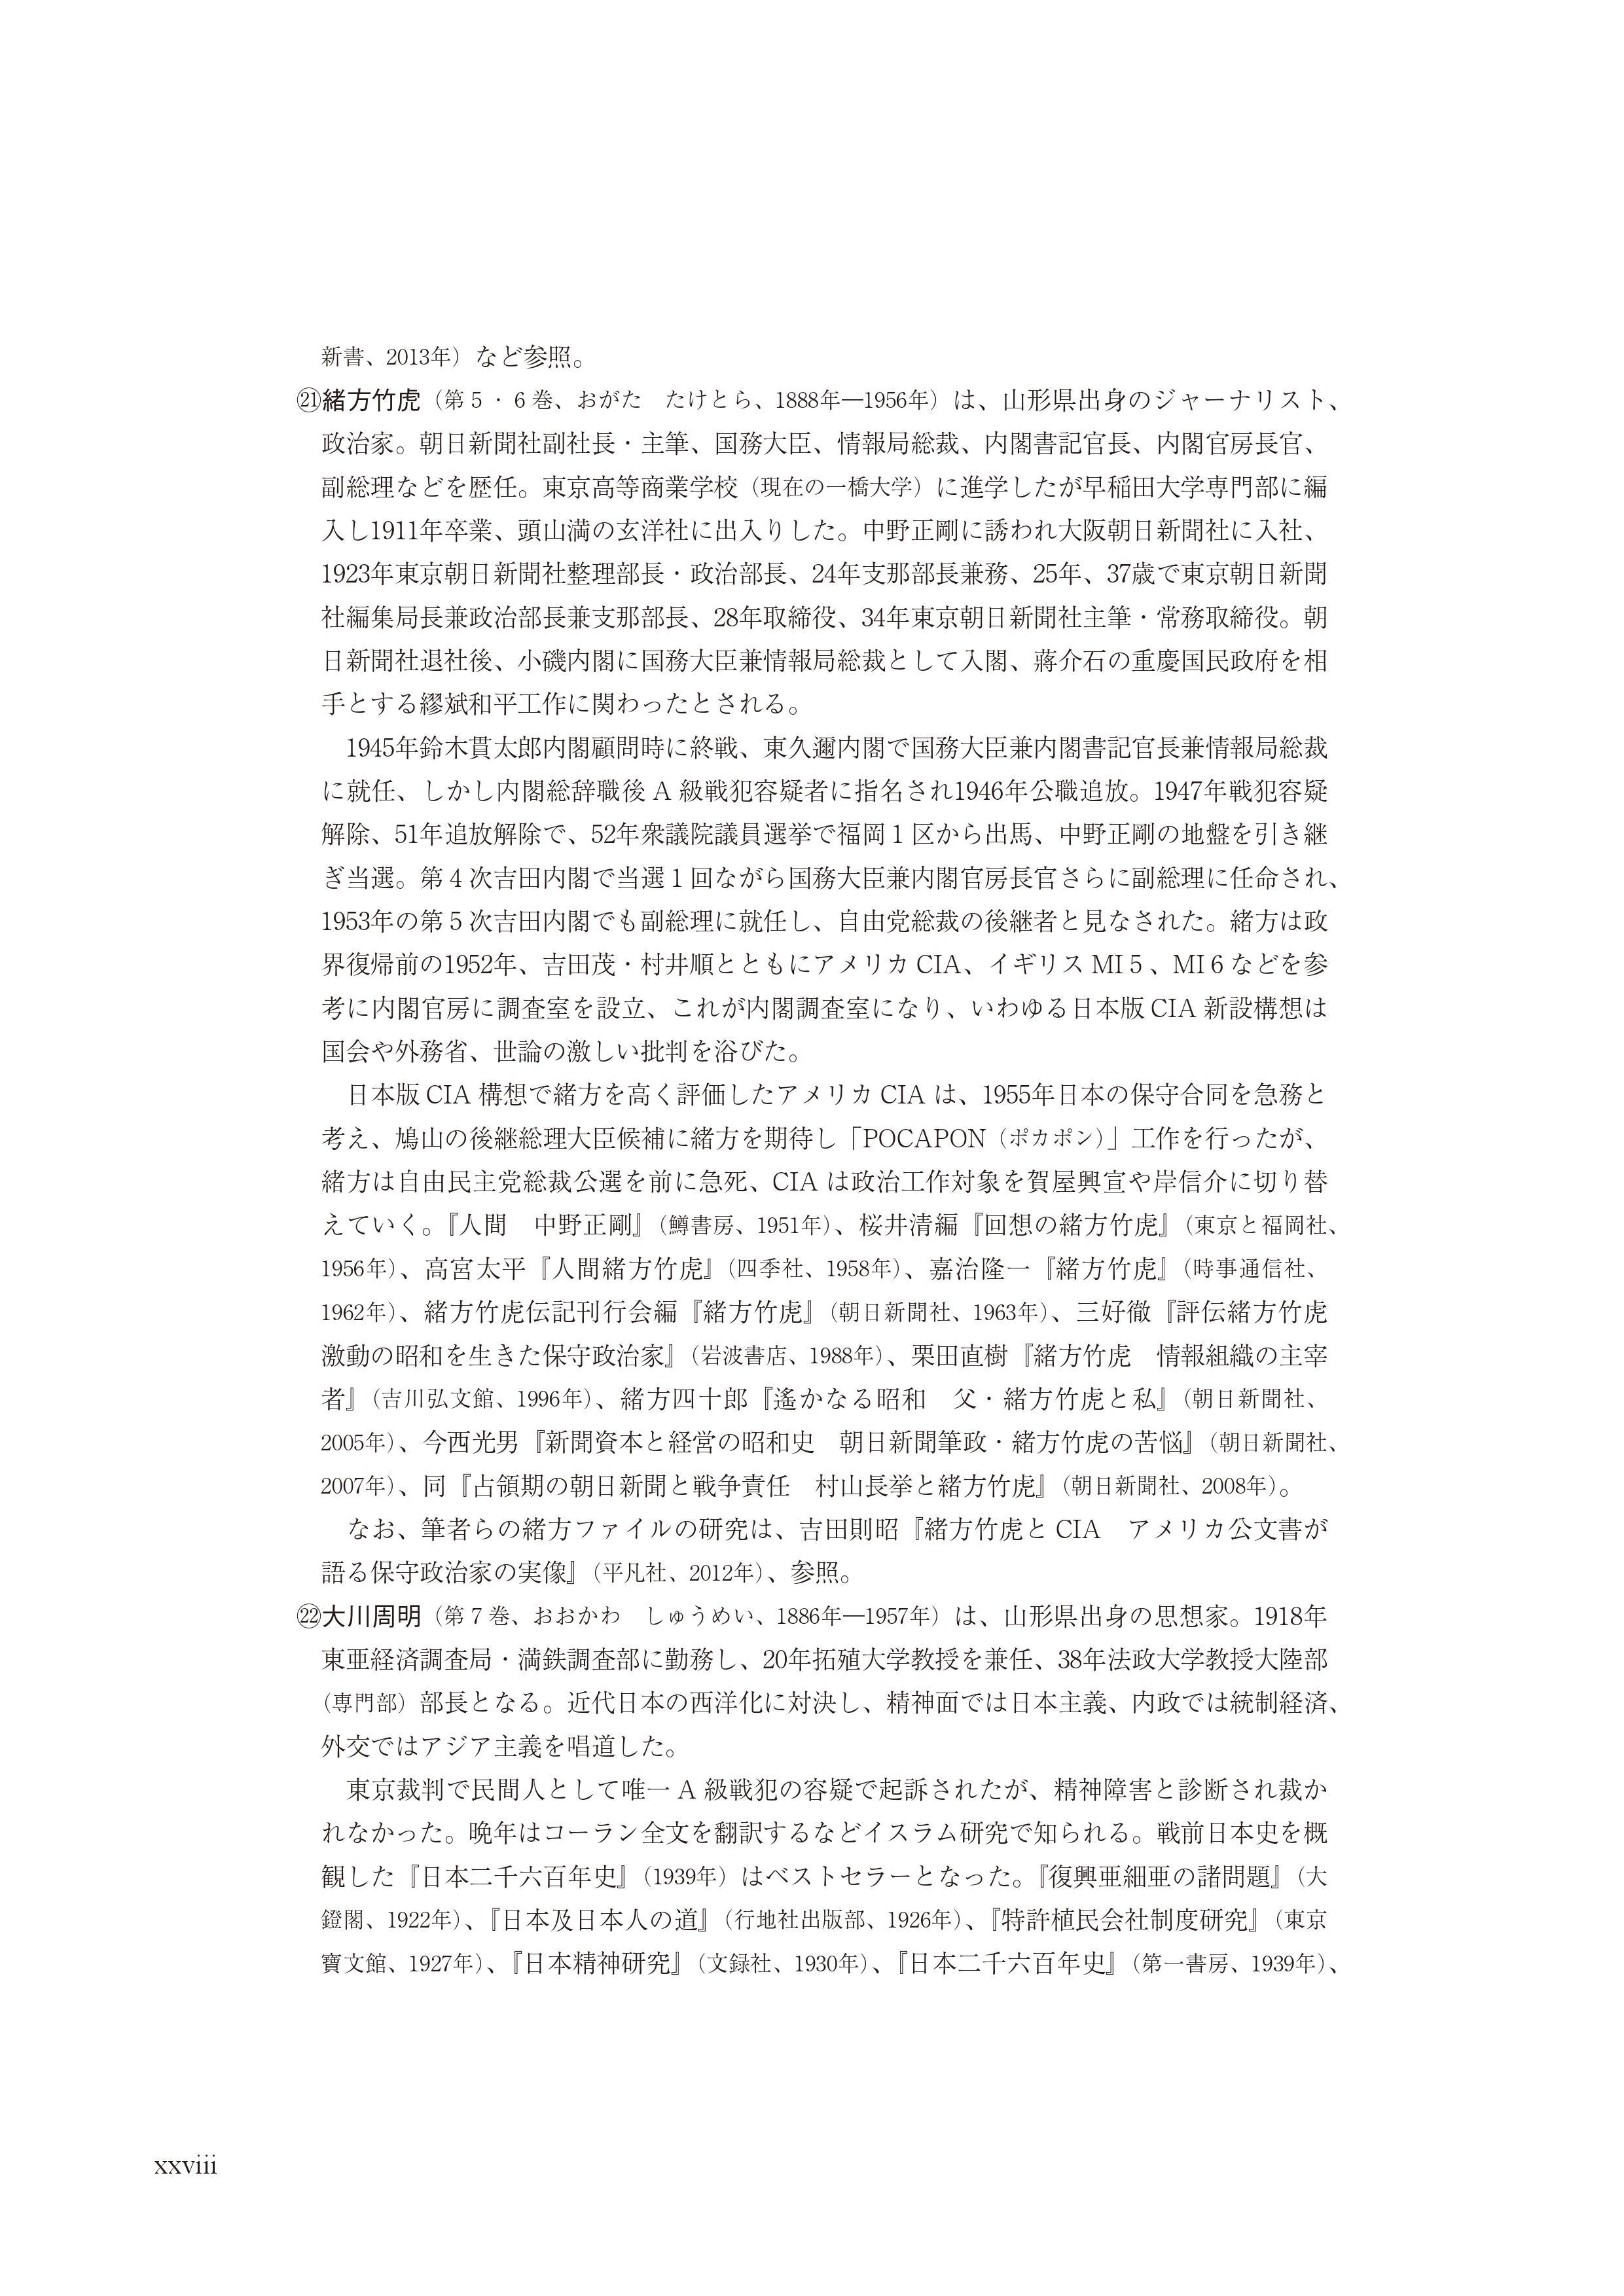 CIA日本人ファイル0001 (28)